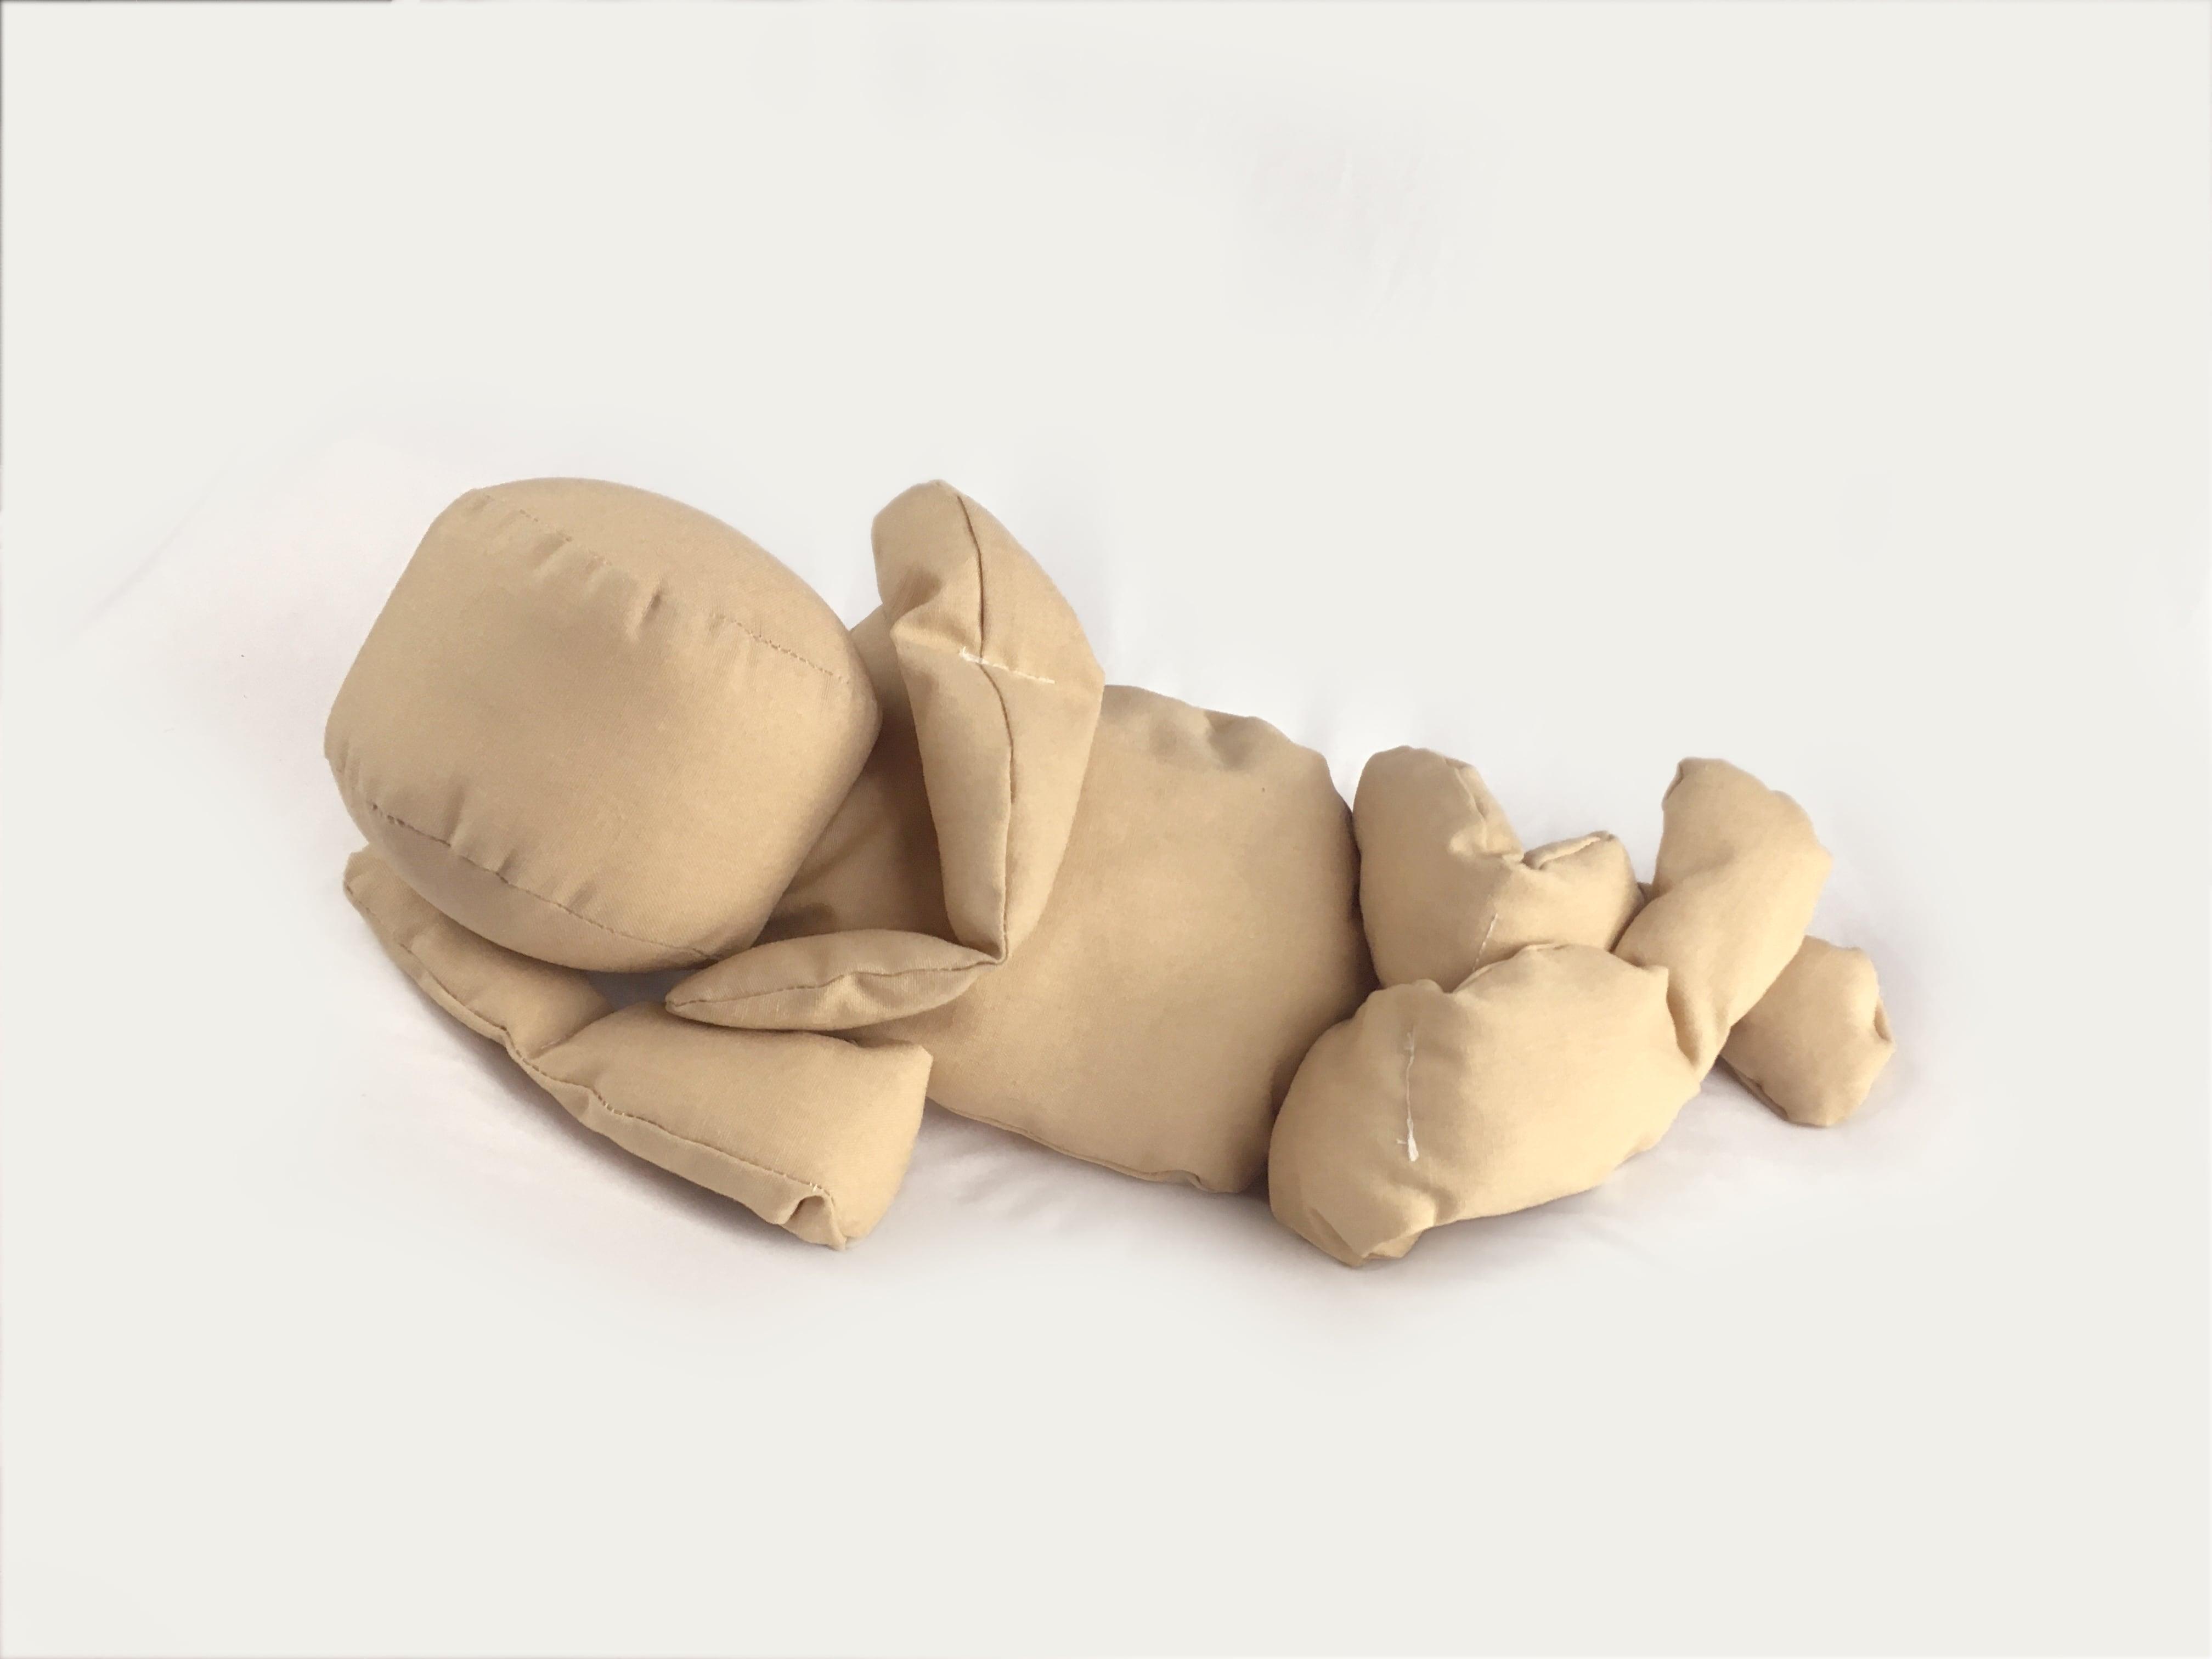 NEW!トレーニング用新生児人形50cm(1.5kg)